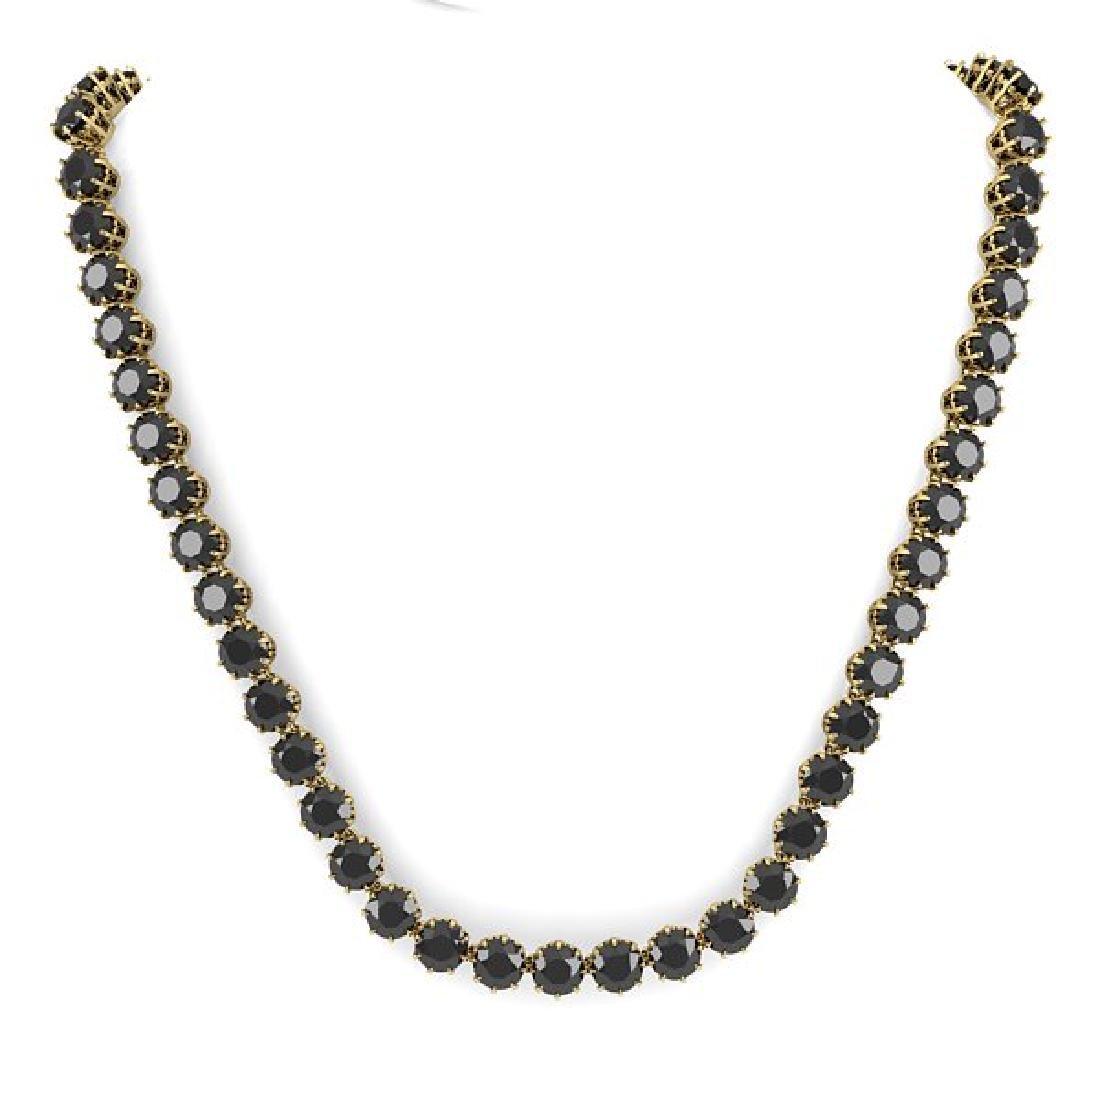 34 CTW Certified Black VS Diamond Necklace 14K Yellow - 2